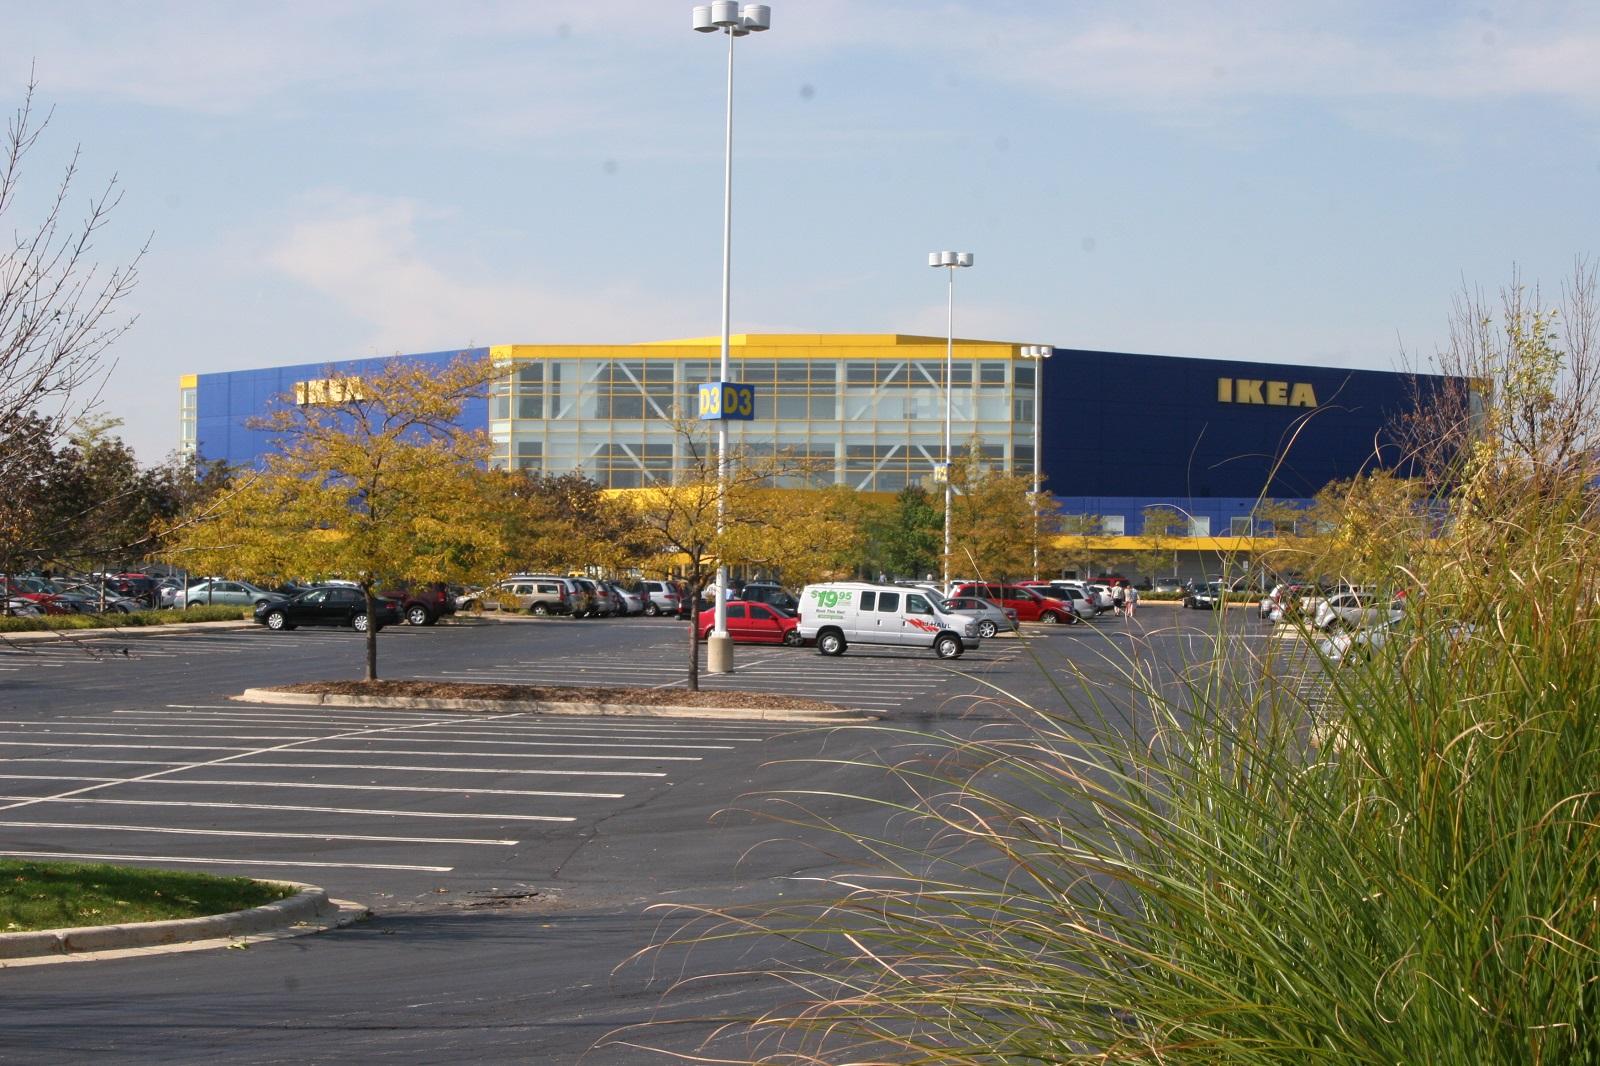 IKEA - Schaumburg 20130930 111